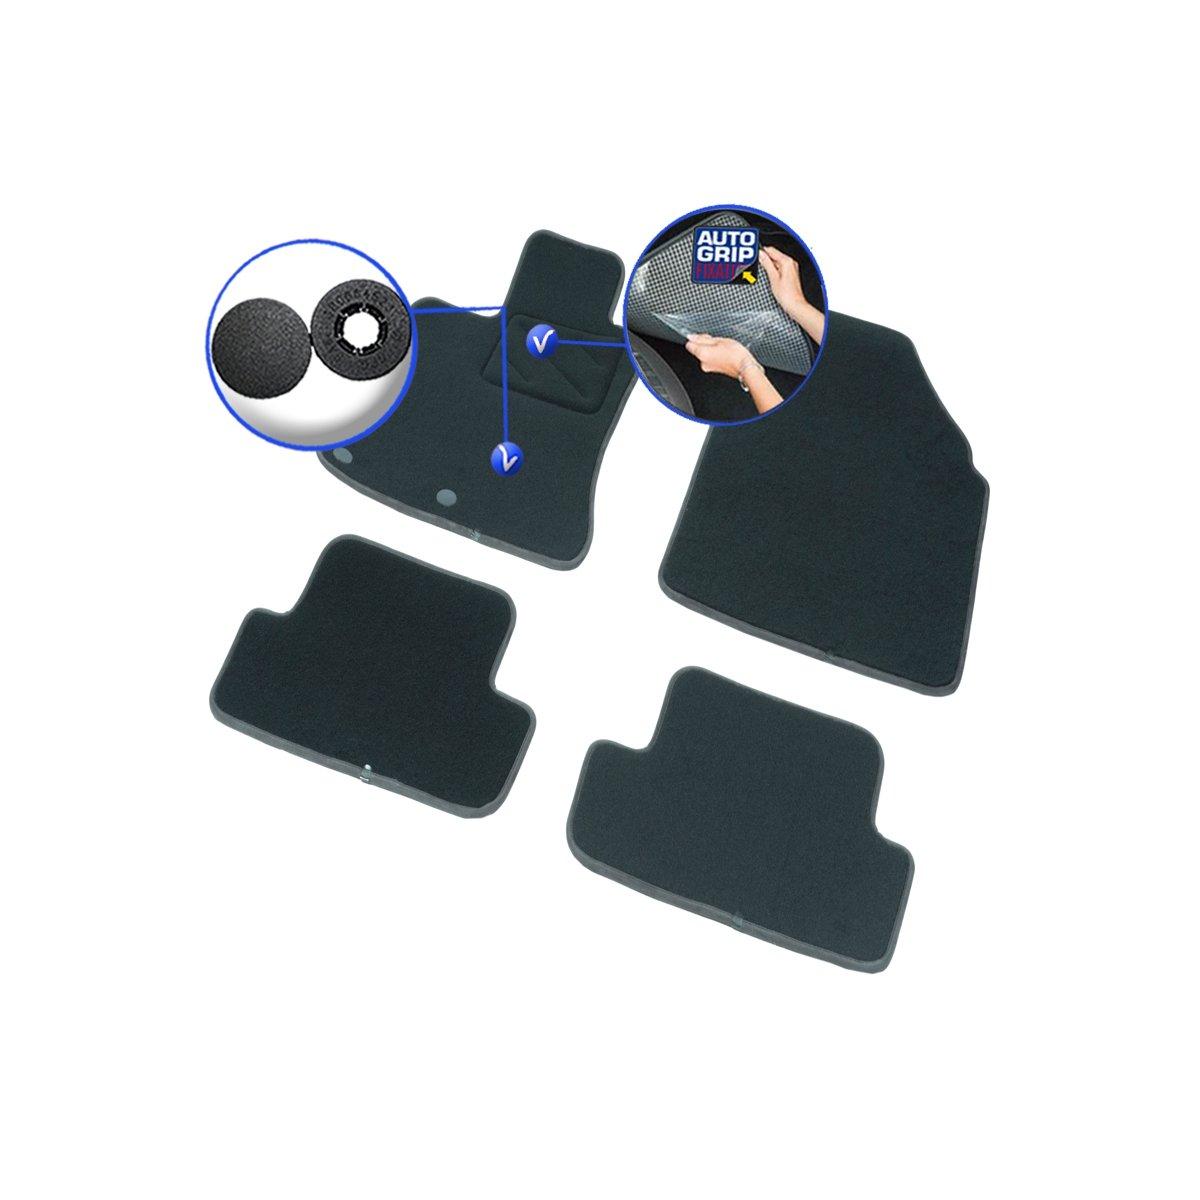 tapis voiture sur mesure elite 12weub0703406. Black Bedroom Furniture Sets. Home Design Ideas